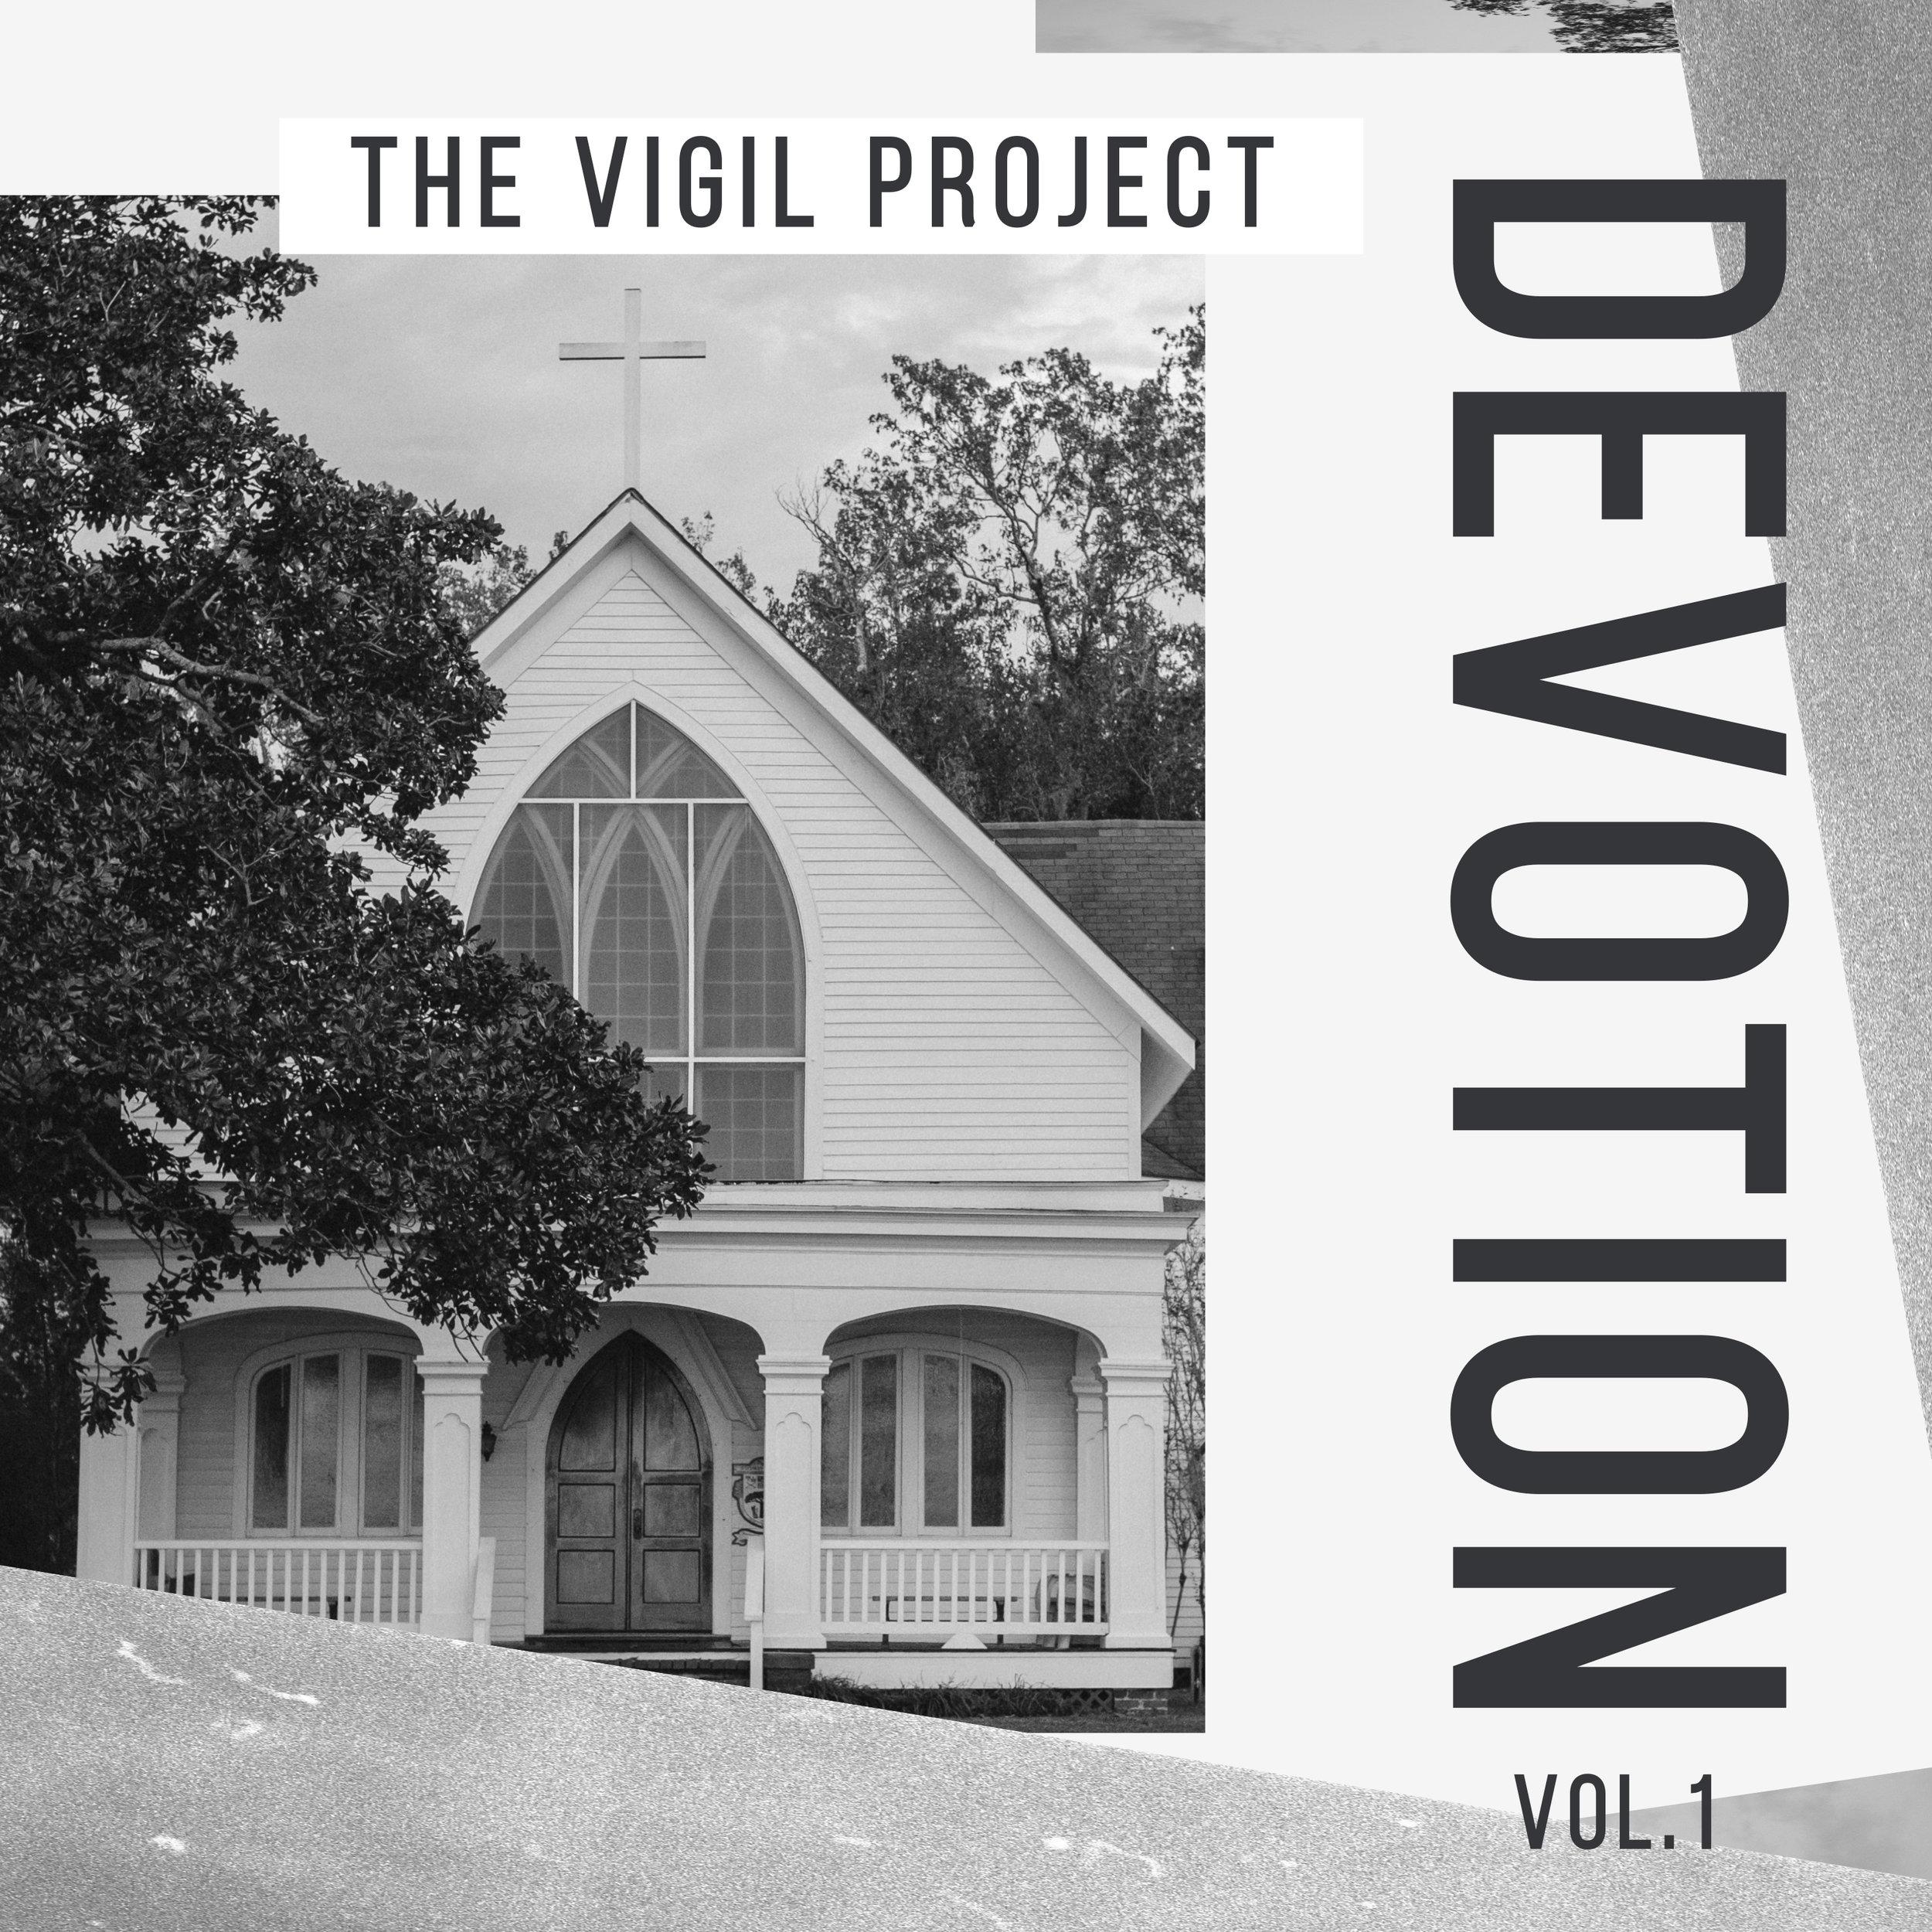 Devotion vol. 1 by The Vigil Project